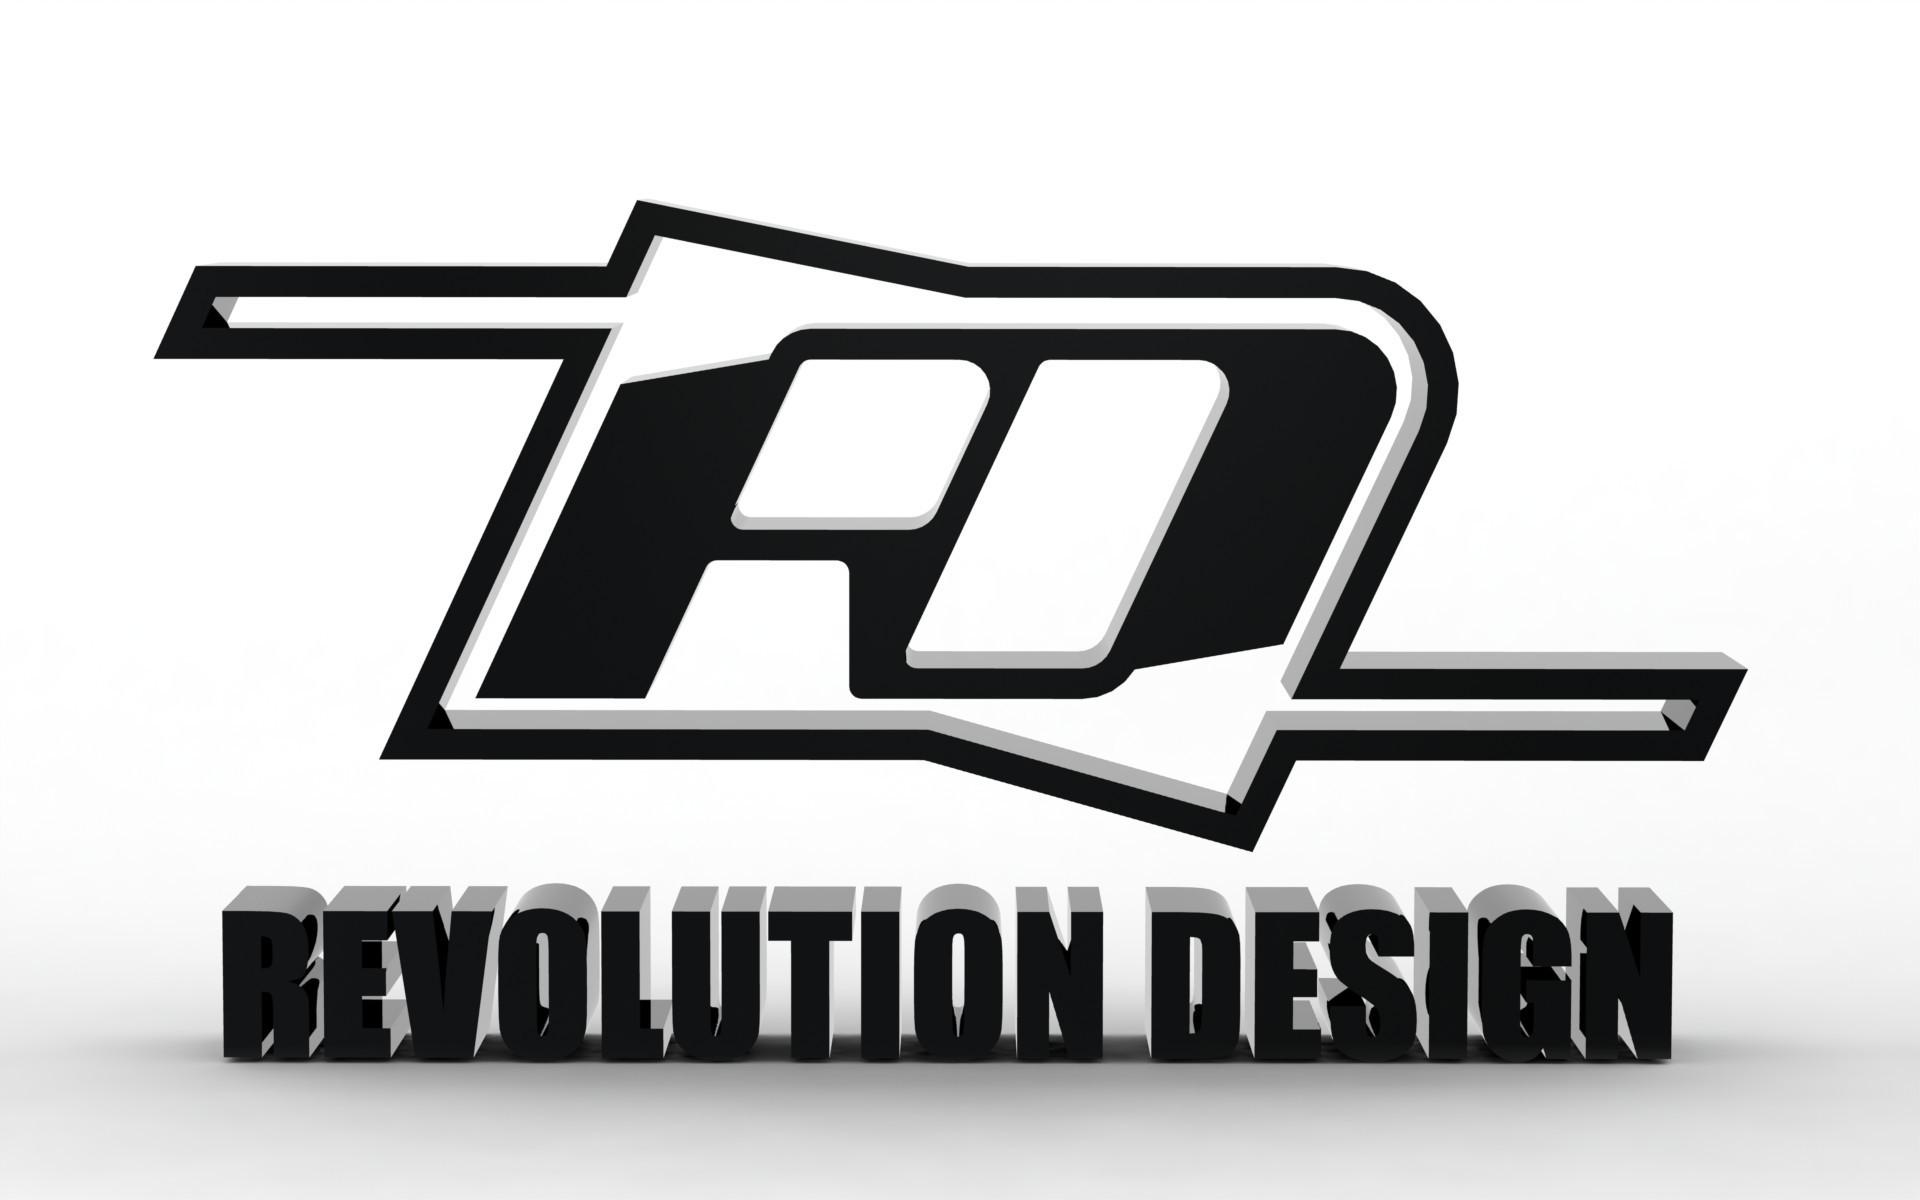 Revolution Design